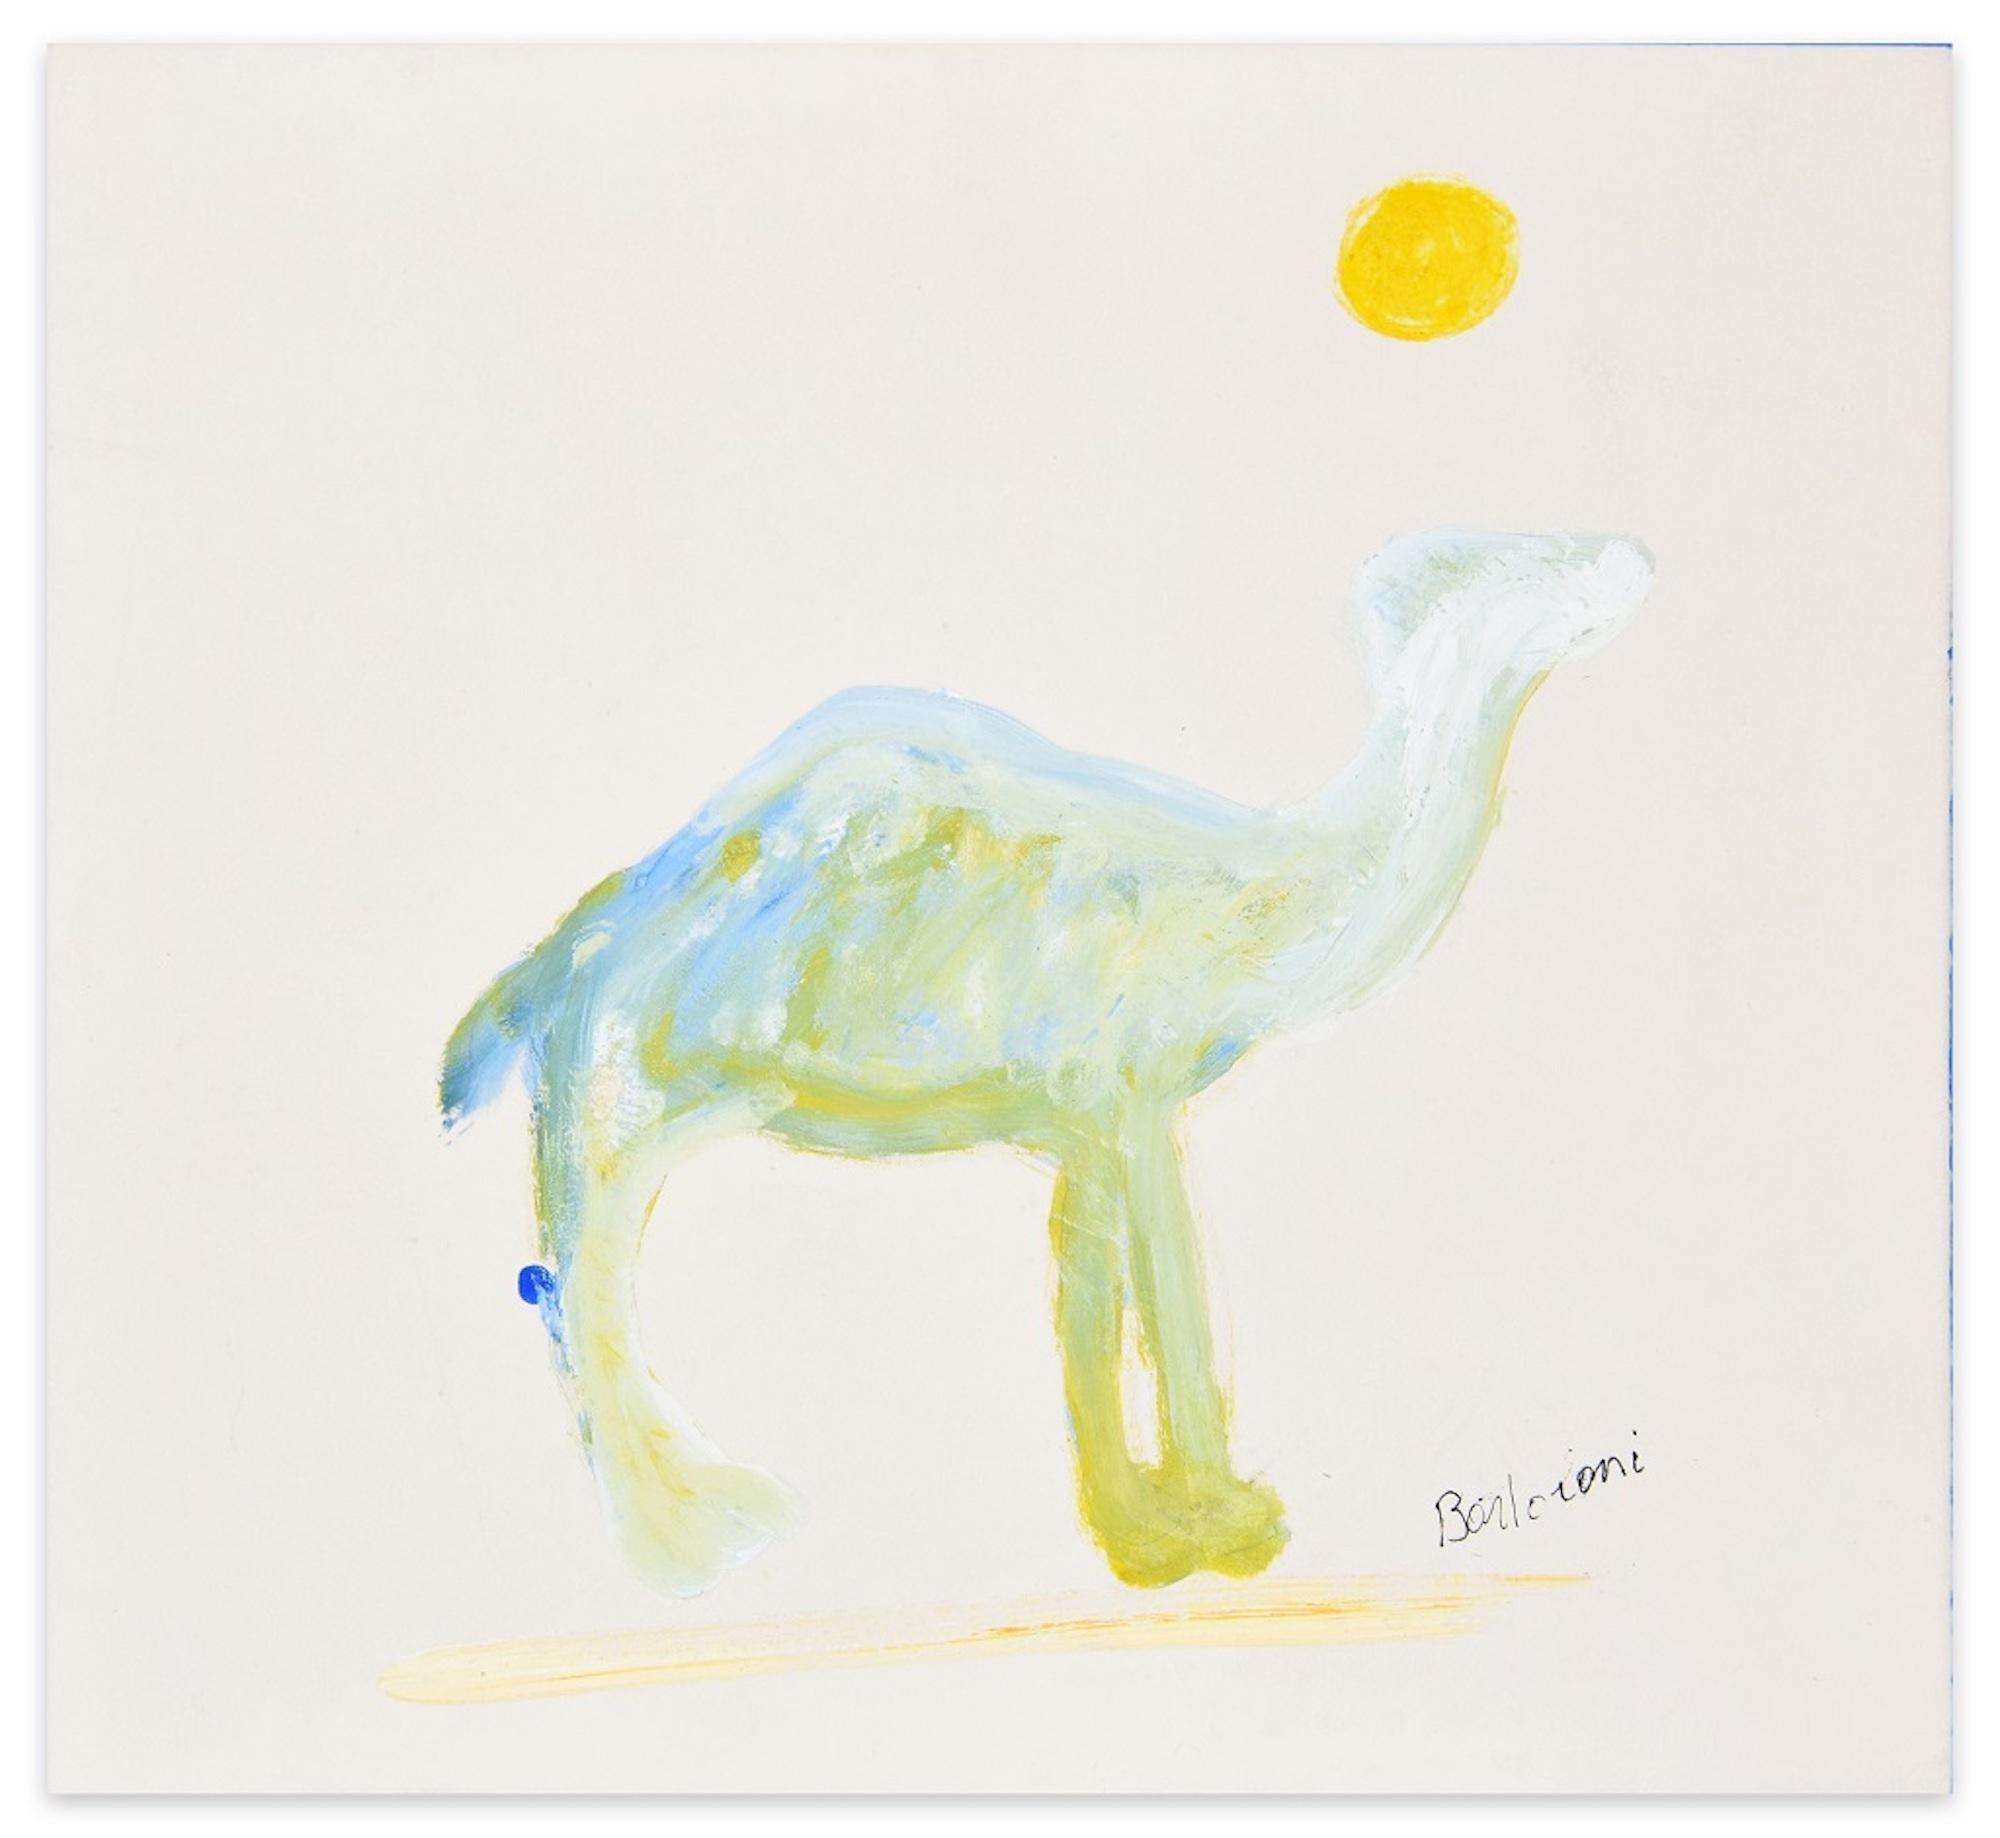 Camel - Oil on Cardboard by Lillo Bartoloni - 1974